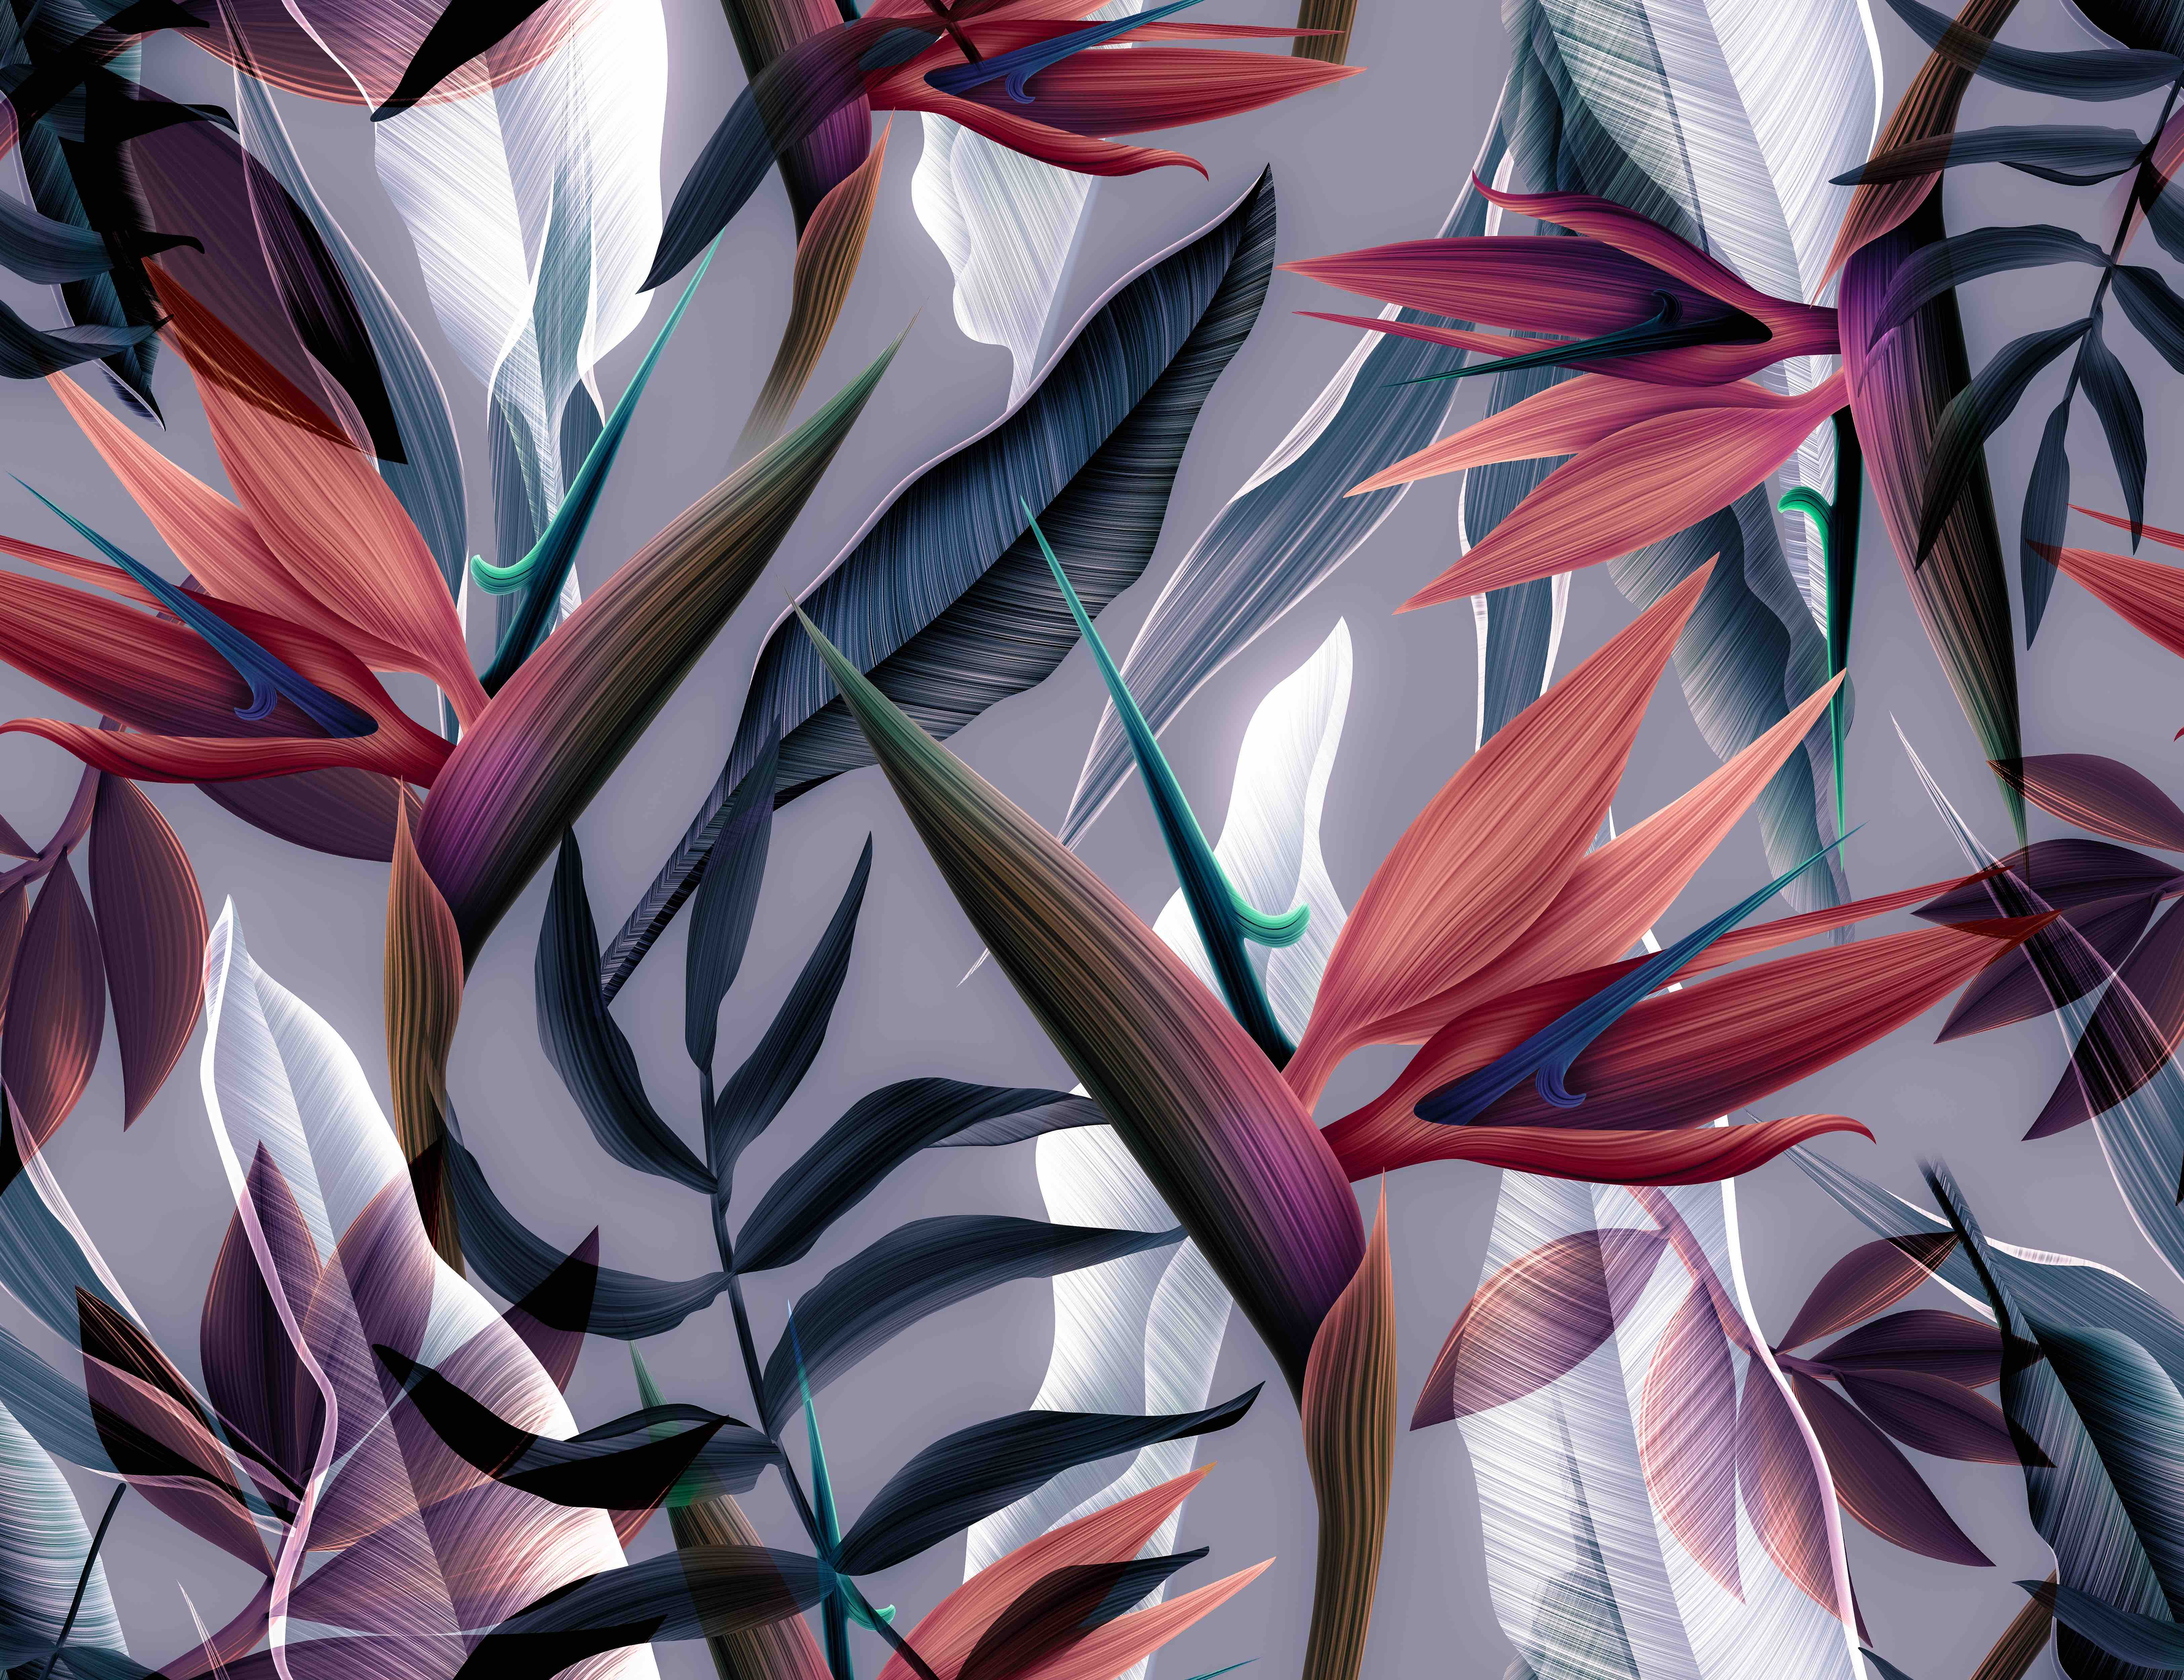 Wallpaper Mural Exotic Garden Theme